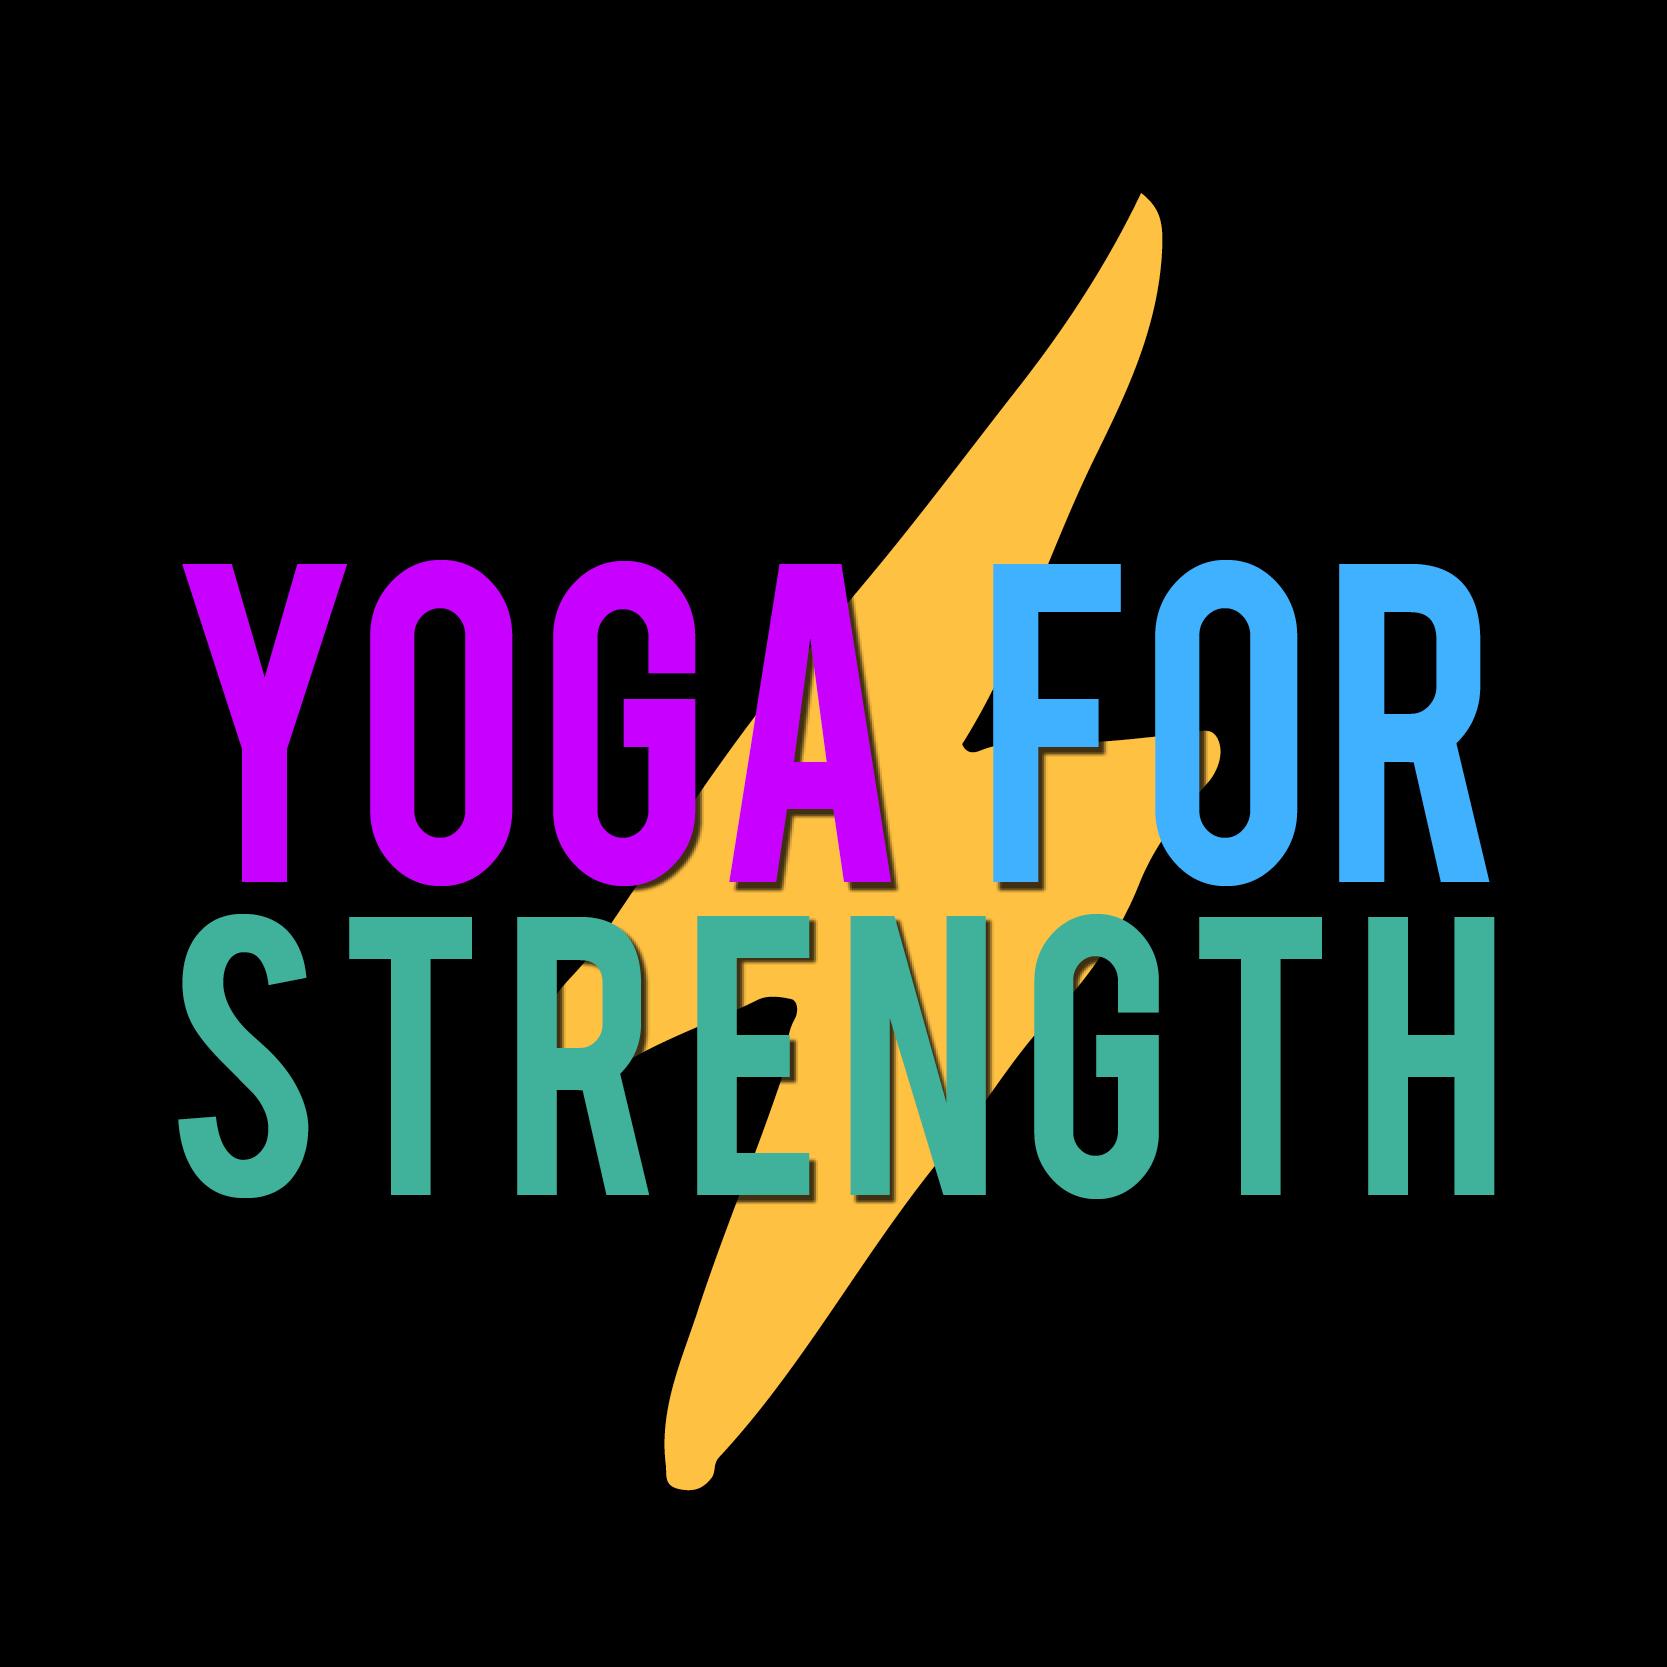 yogaforstrength.jpg